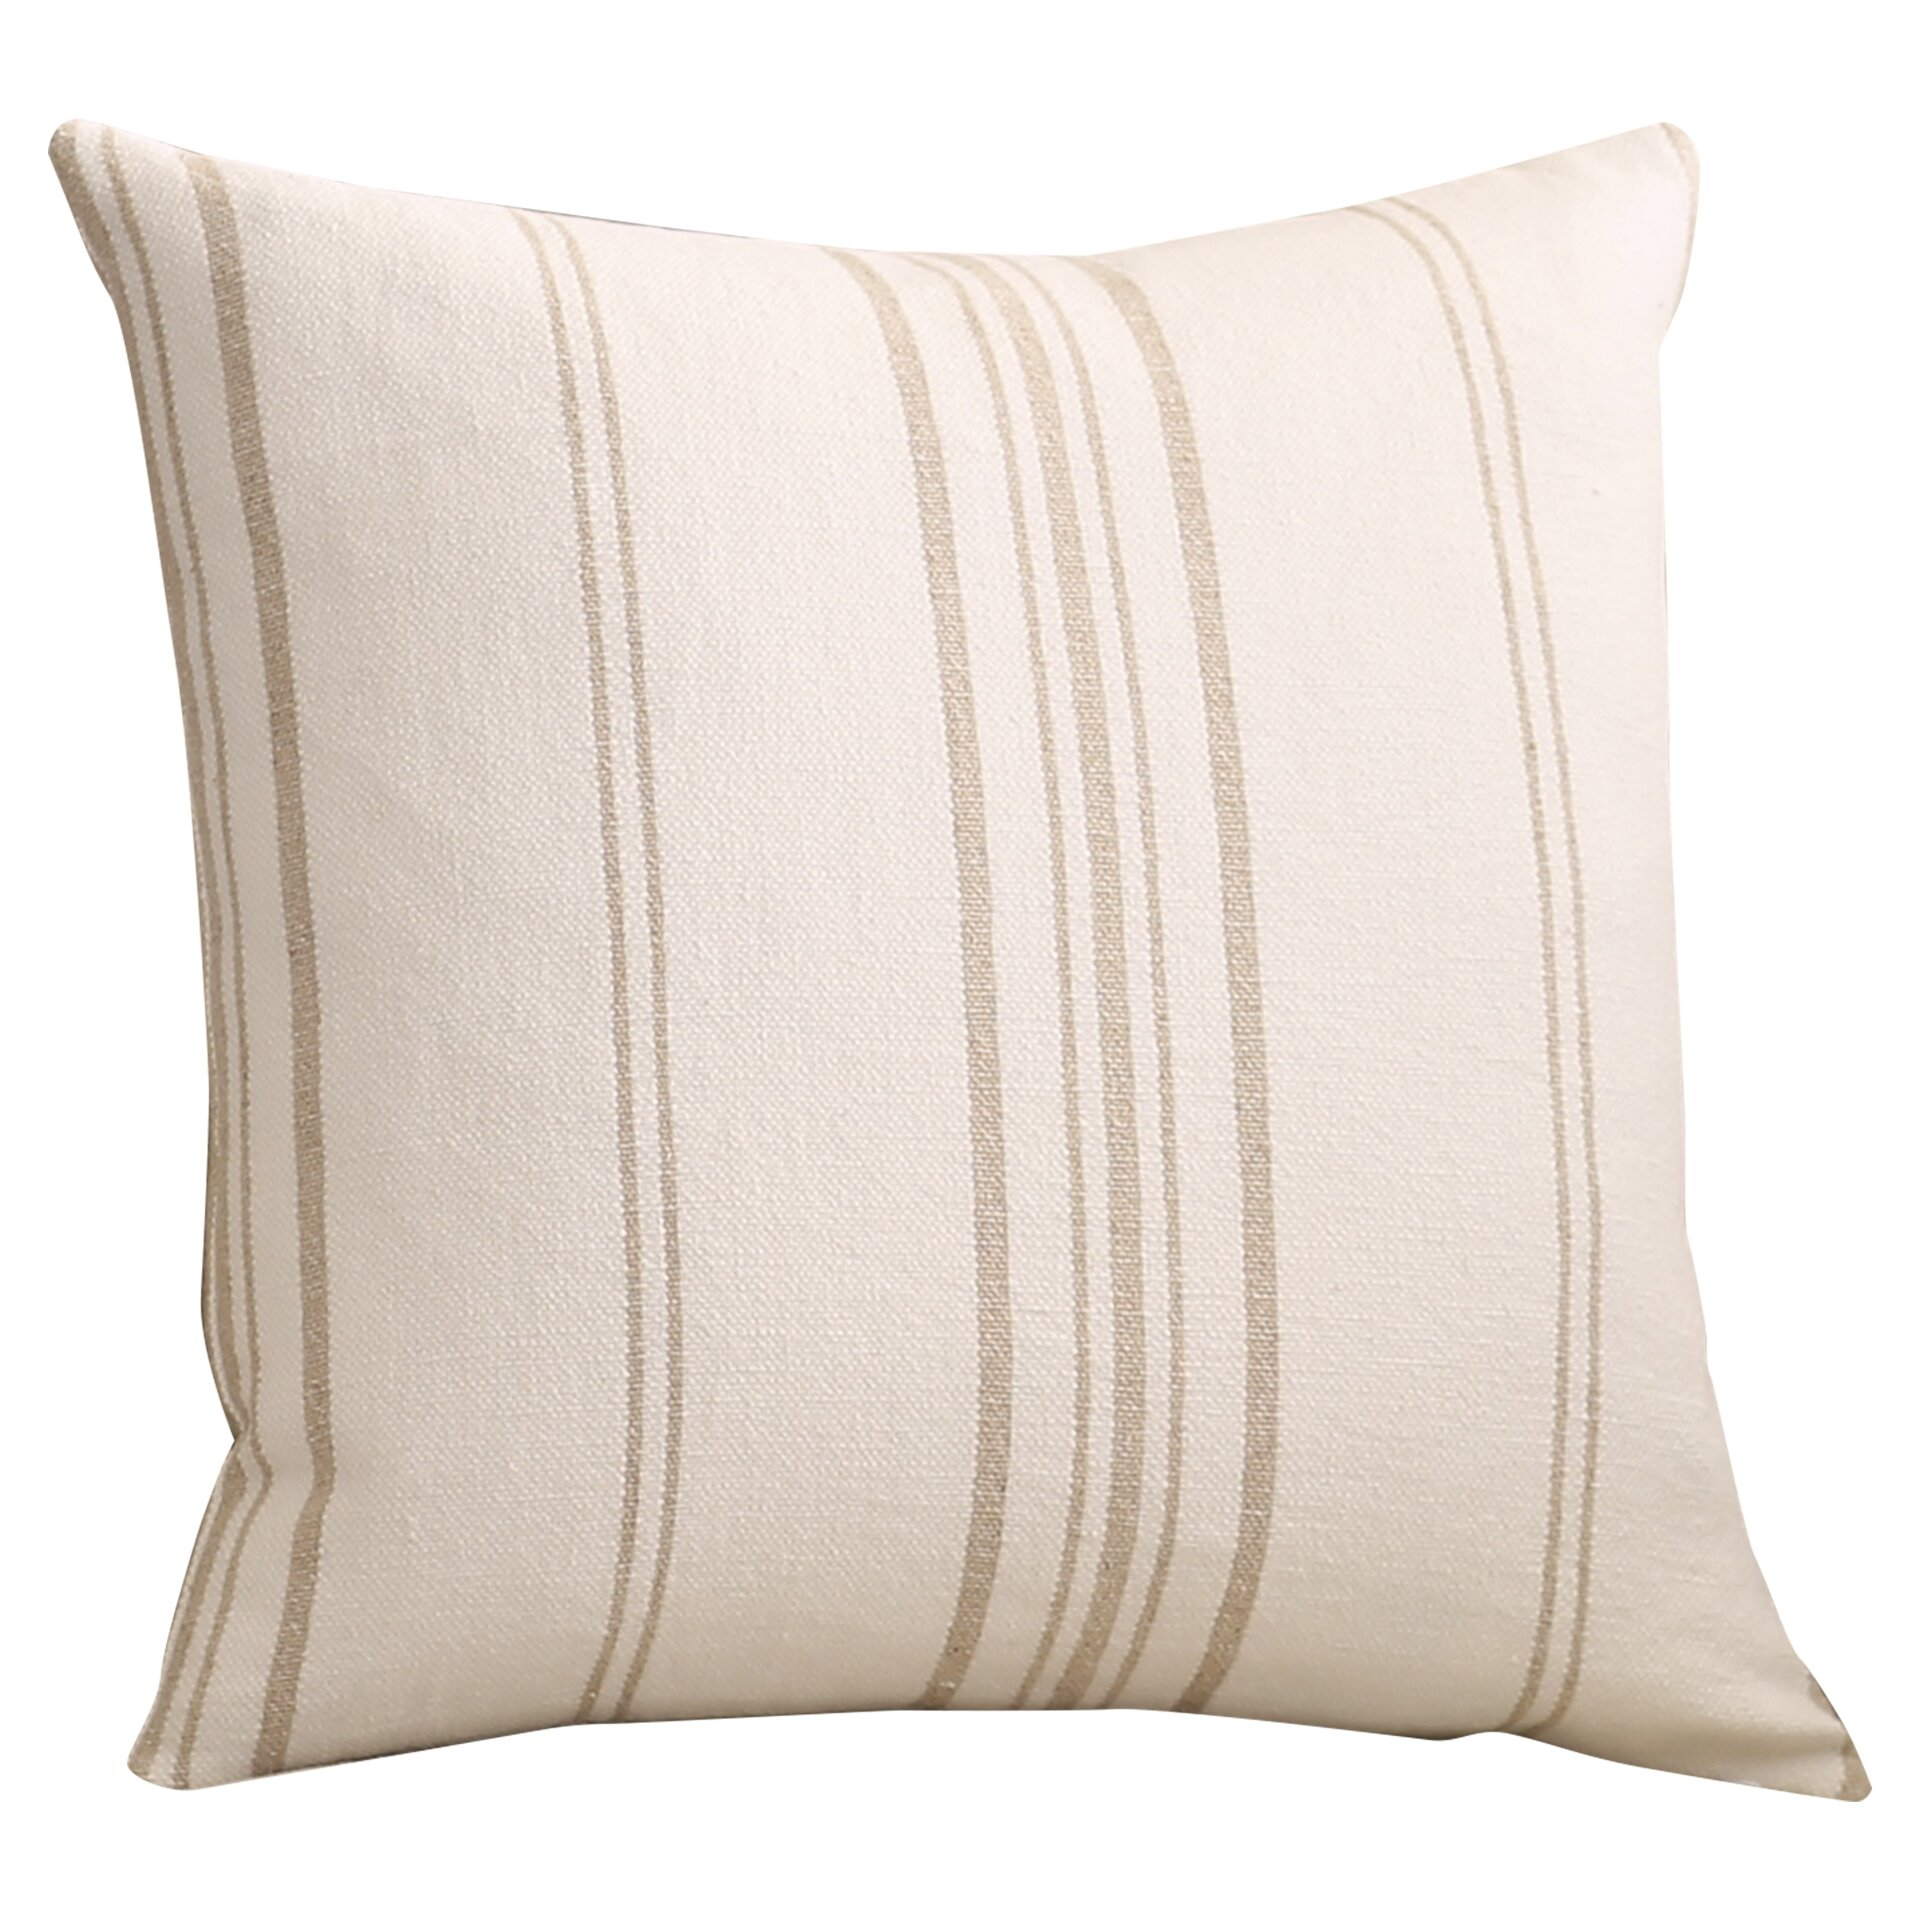 Striped Linen Throw Pillow : One Allium Way Lilla Stripes Linen Throw Pillow & Reviews Wayfair